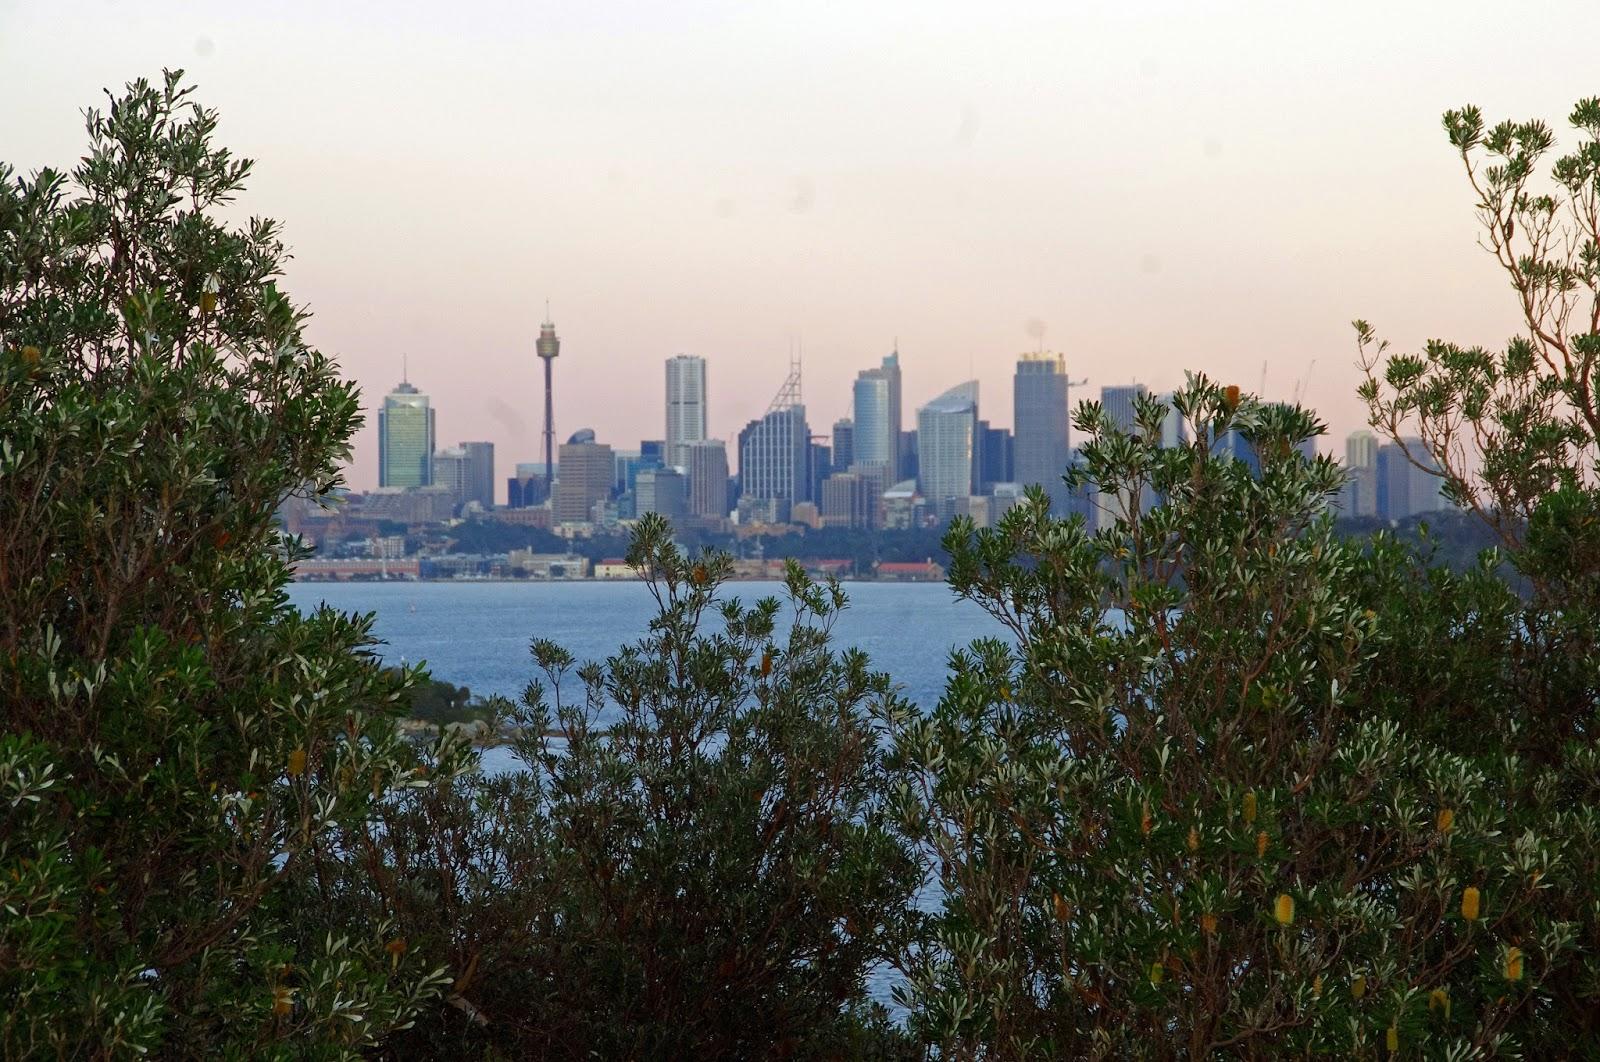 Sydney Skyline from the Gap